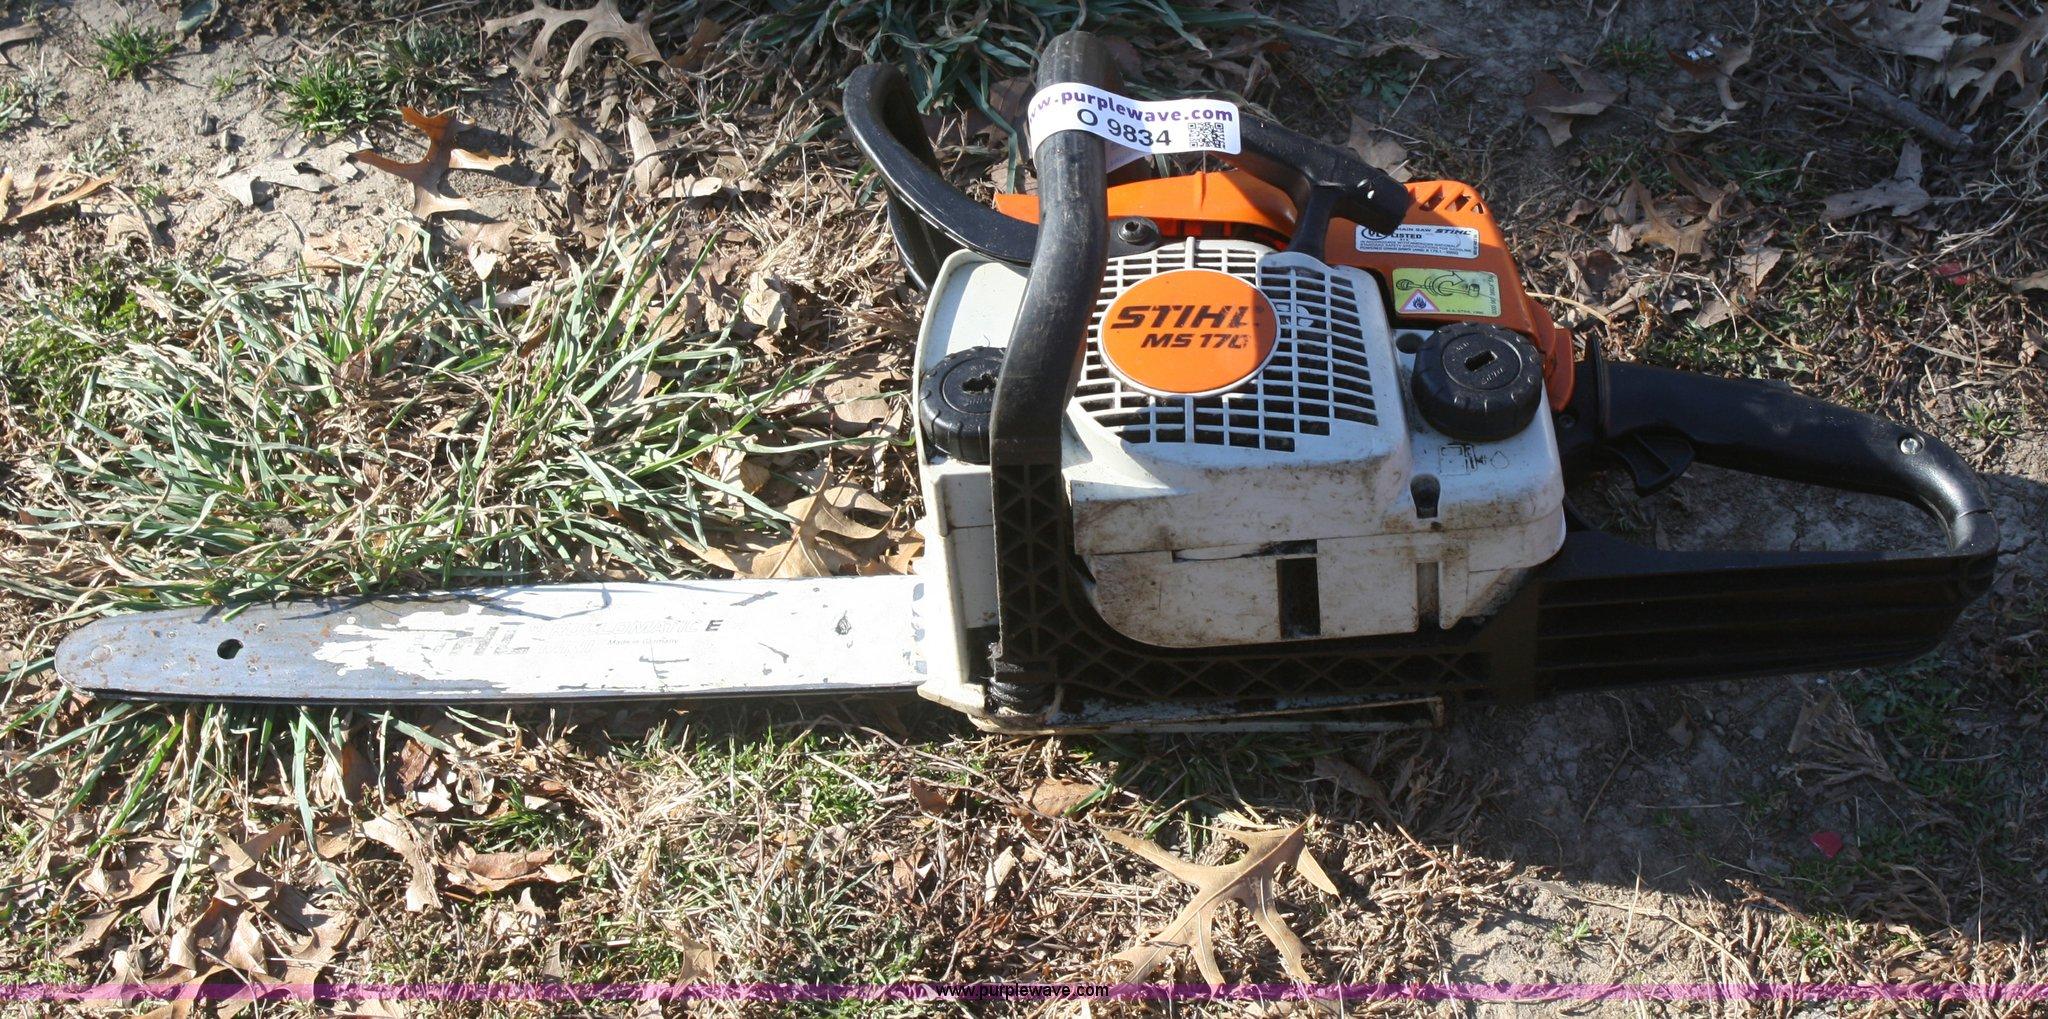 Stihl MS170 chain saw | Item O9834 | SOLD! Thursday December